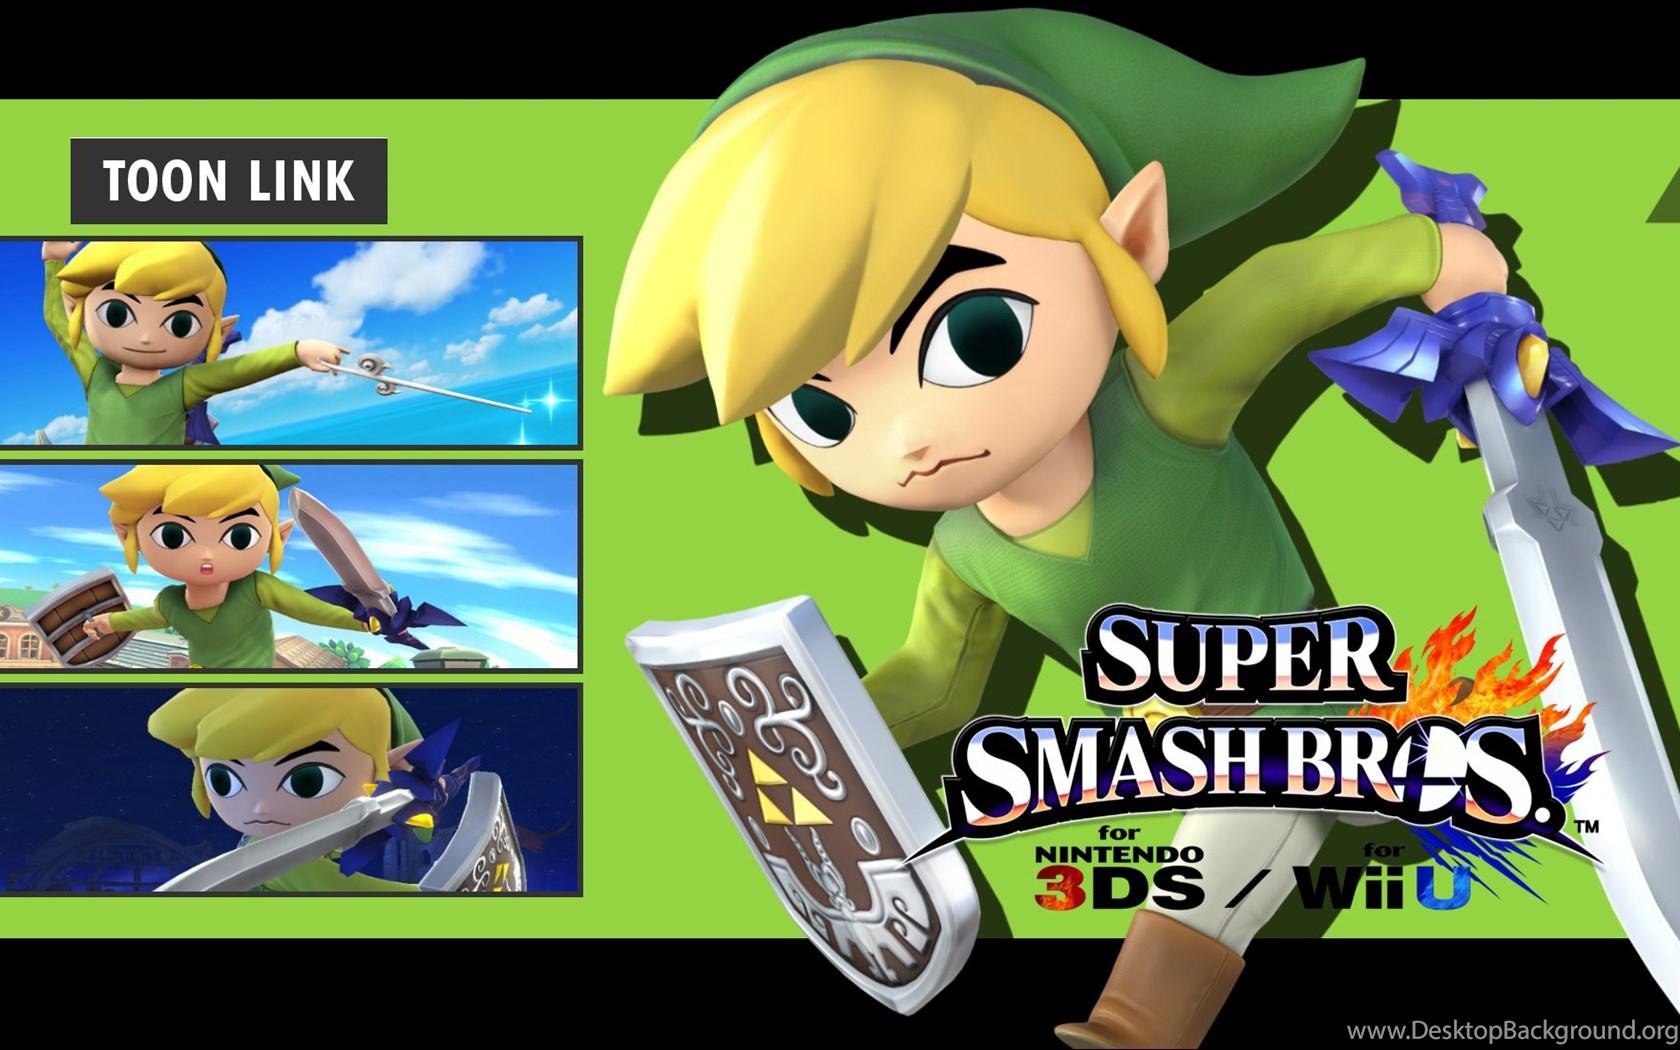 Super Smash Bros 3DS Wii U Toon Link Wallpapers By DaKidGaming